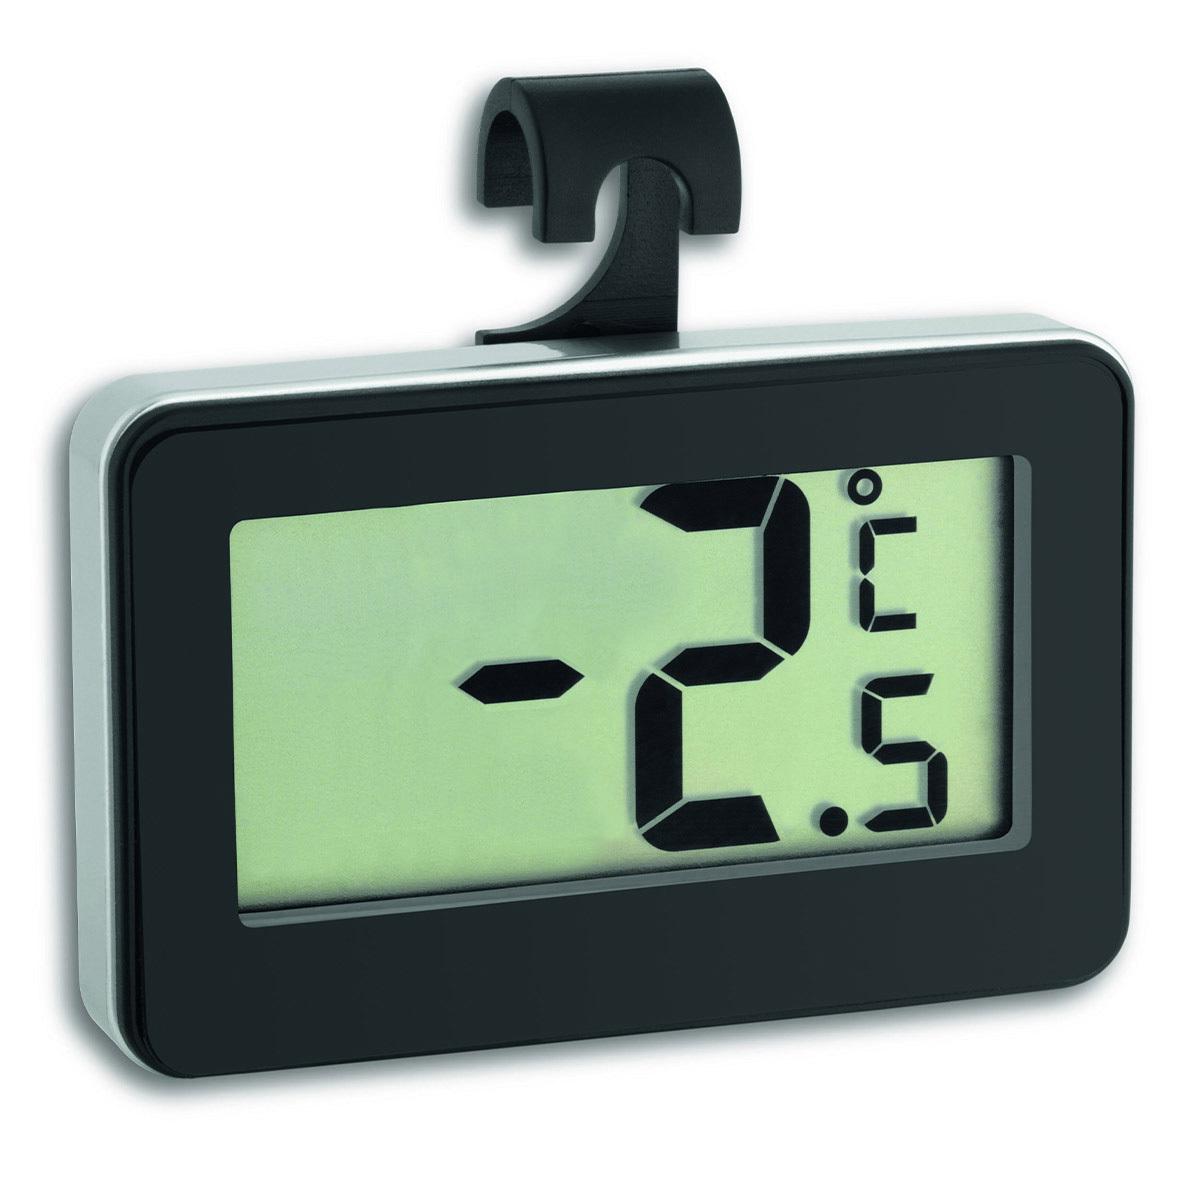 30-2028-01-digitales-thermometer-ansicht-1200x1200px.jpg